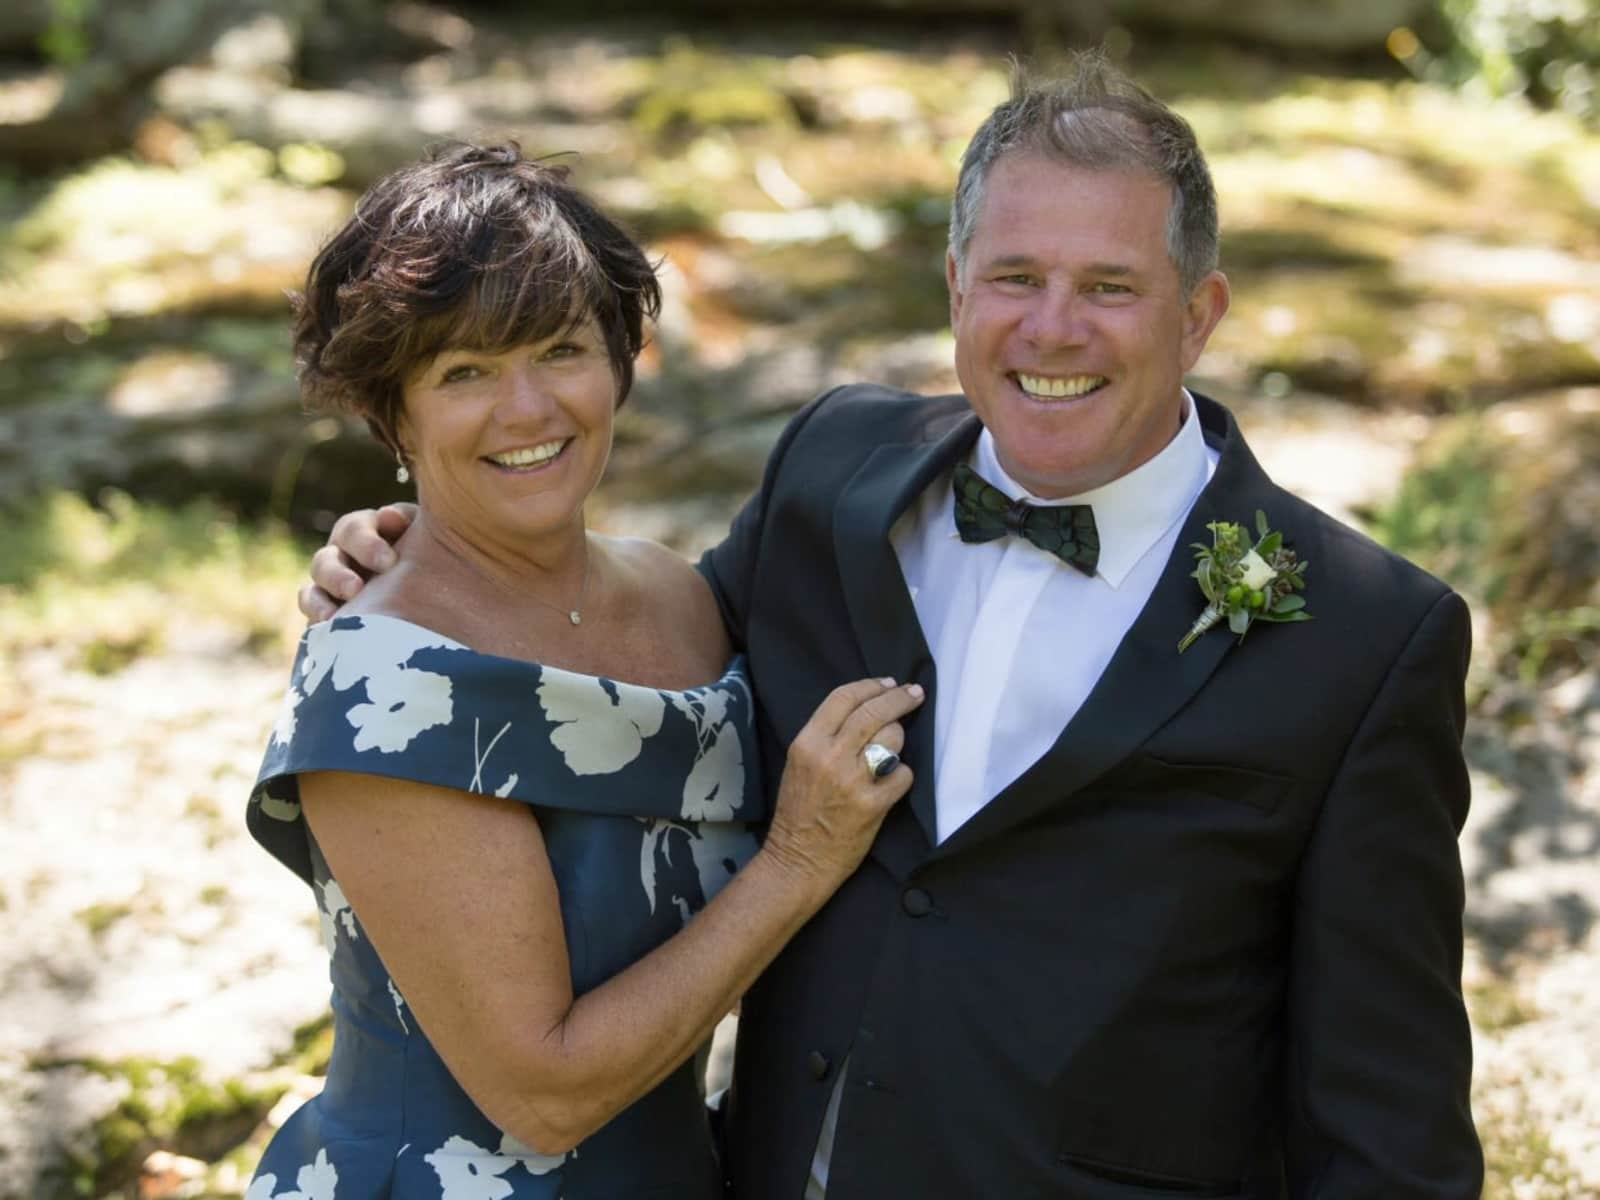 Anne & Steve from Ottawa, Ontario, Canada